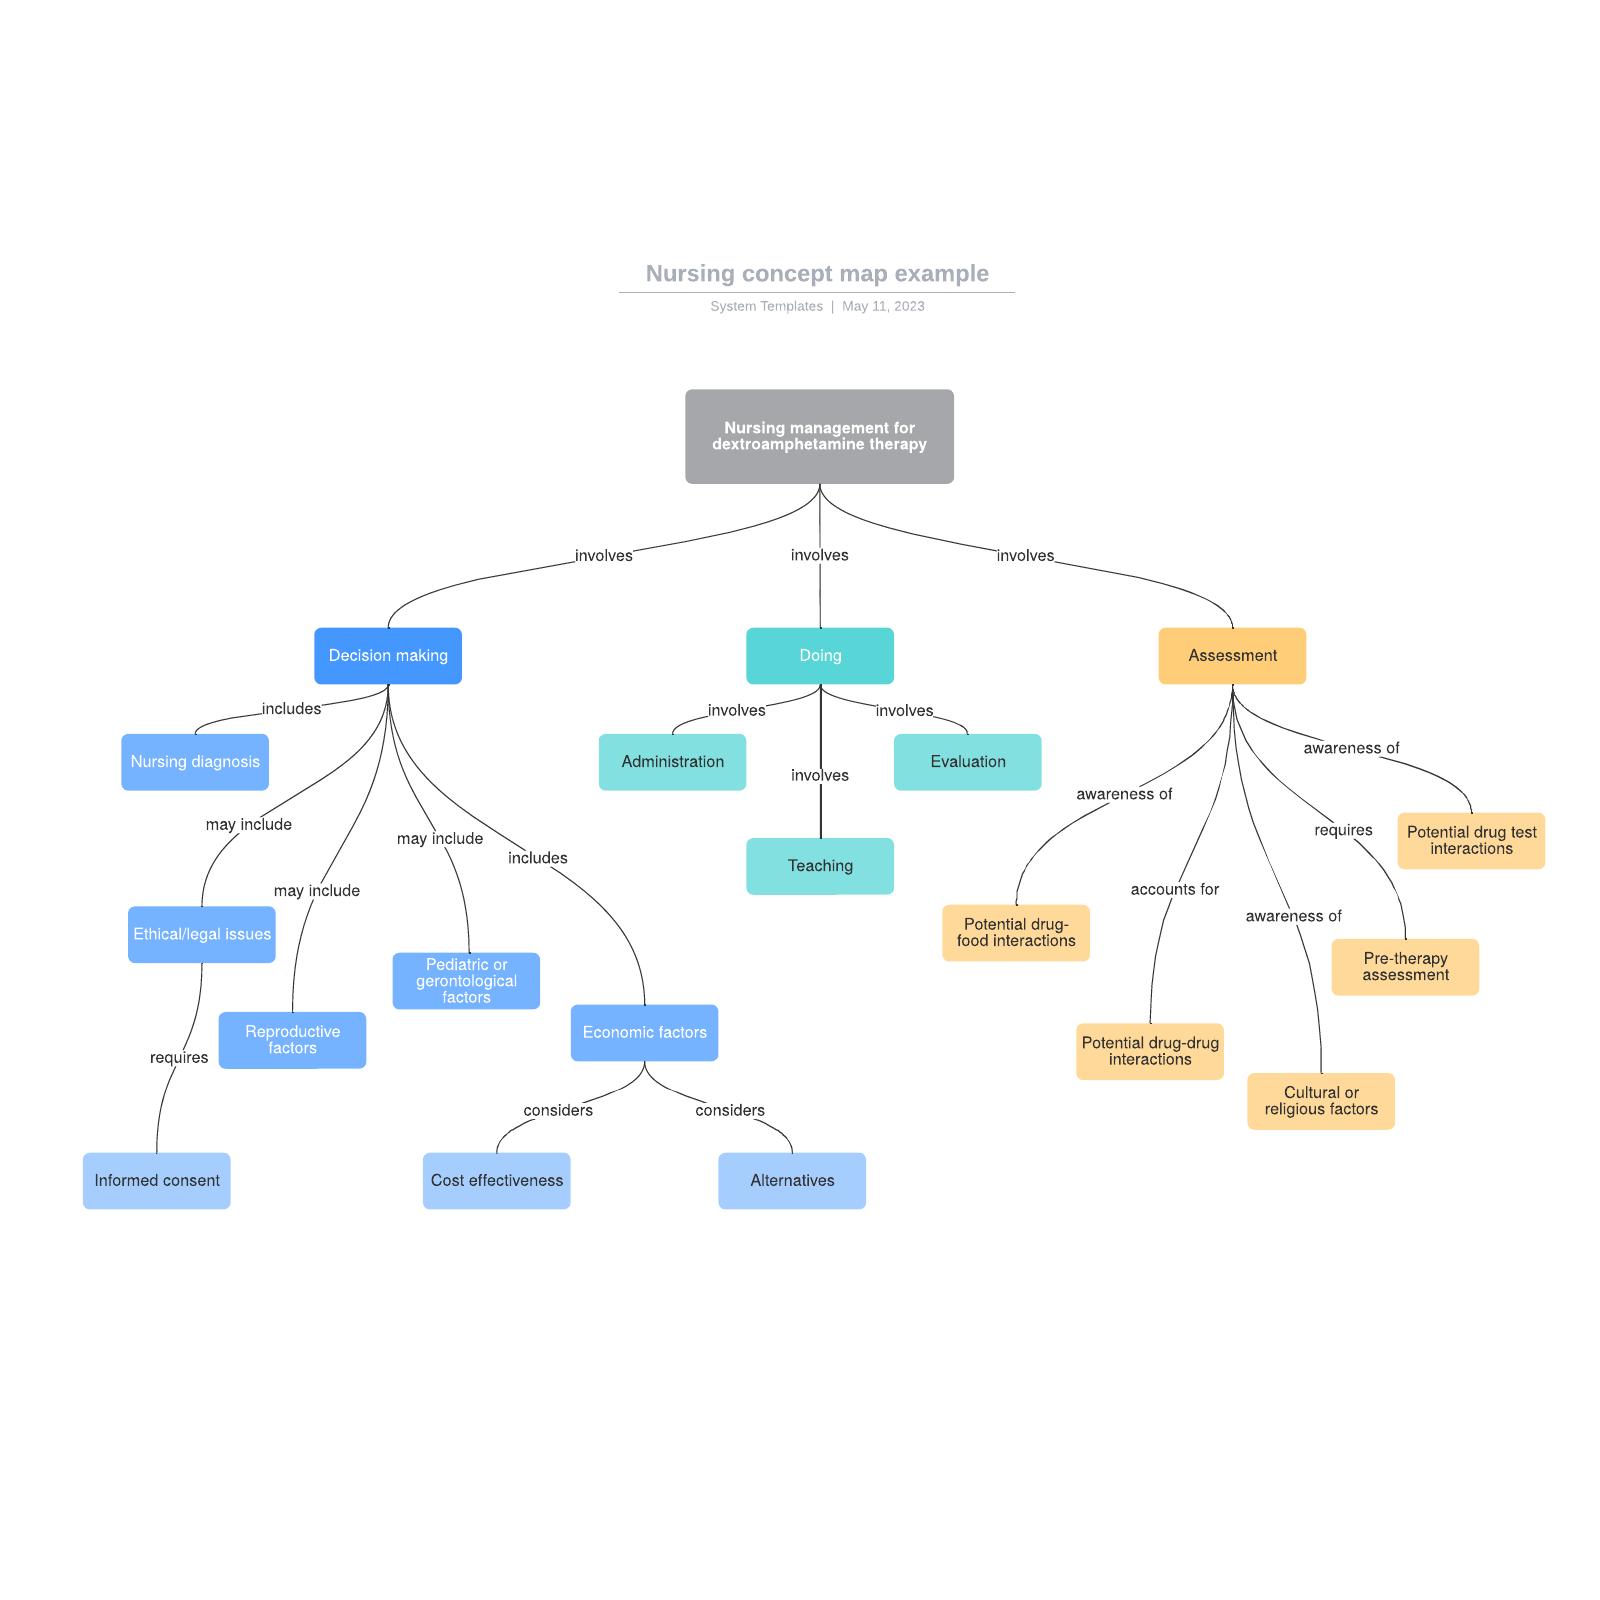 Nursing concept map example